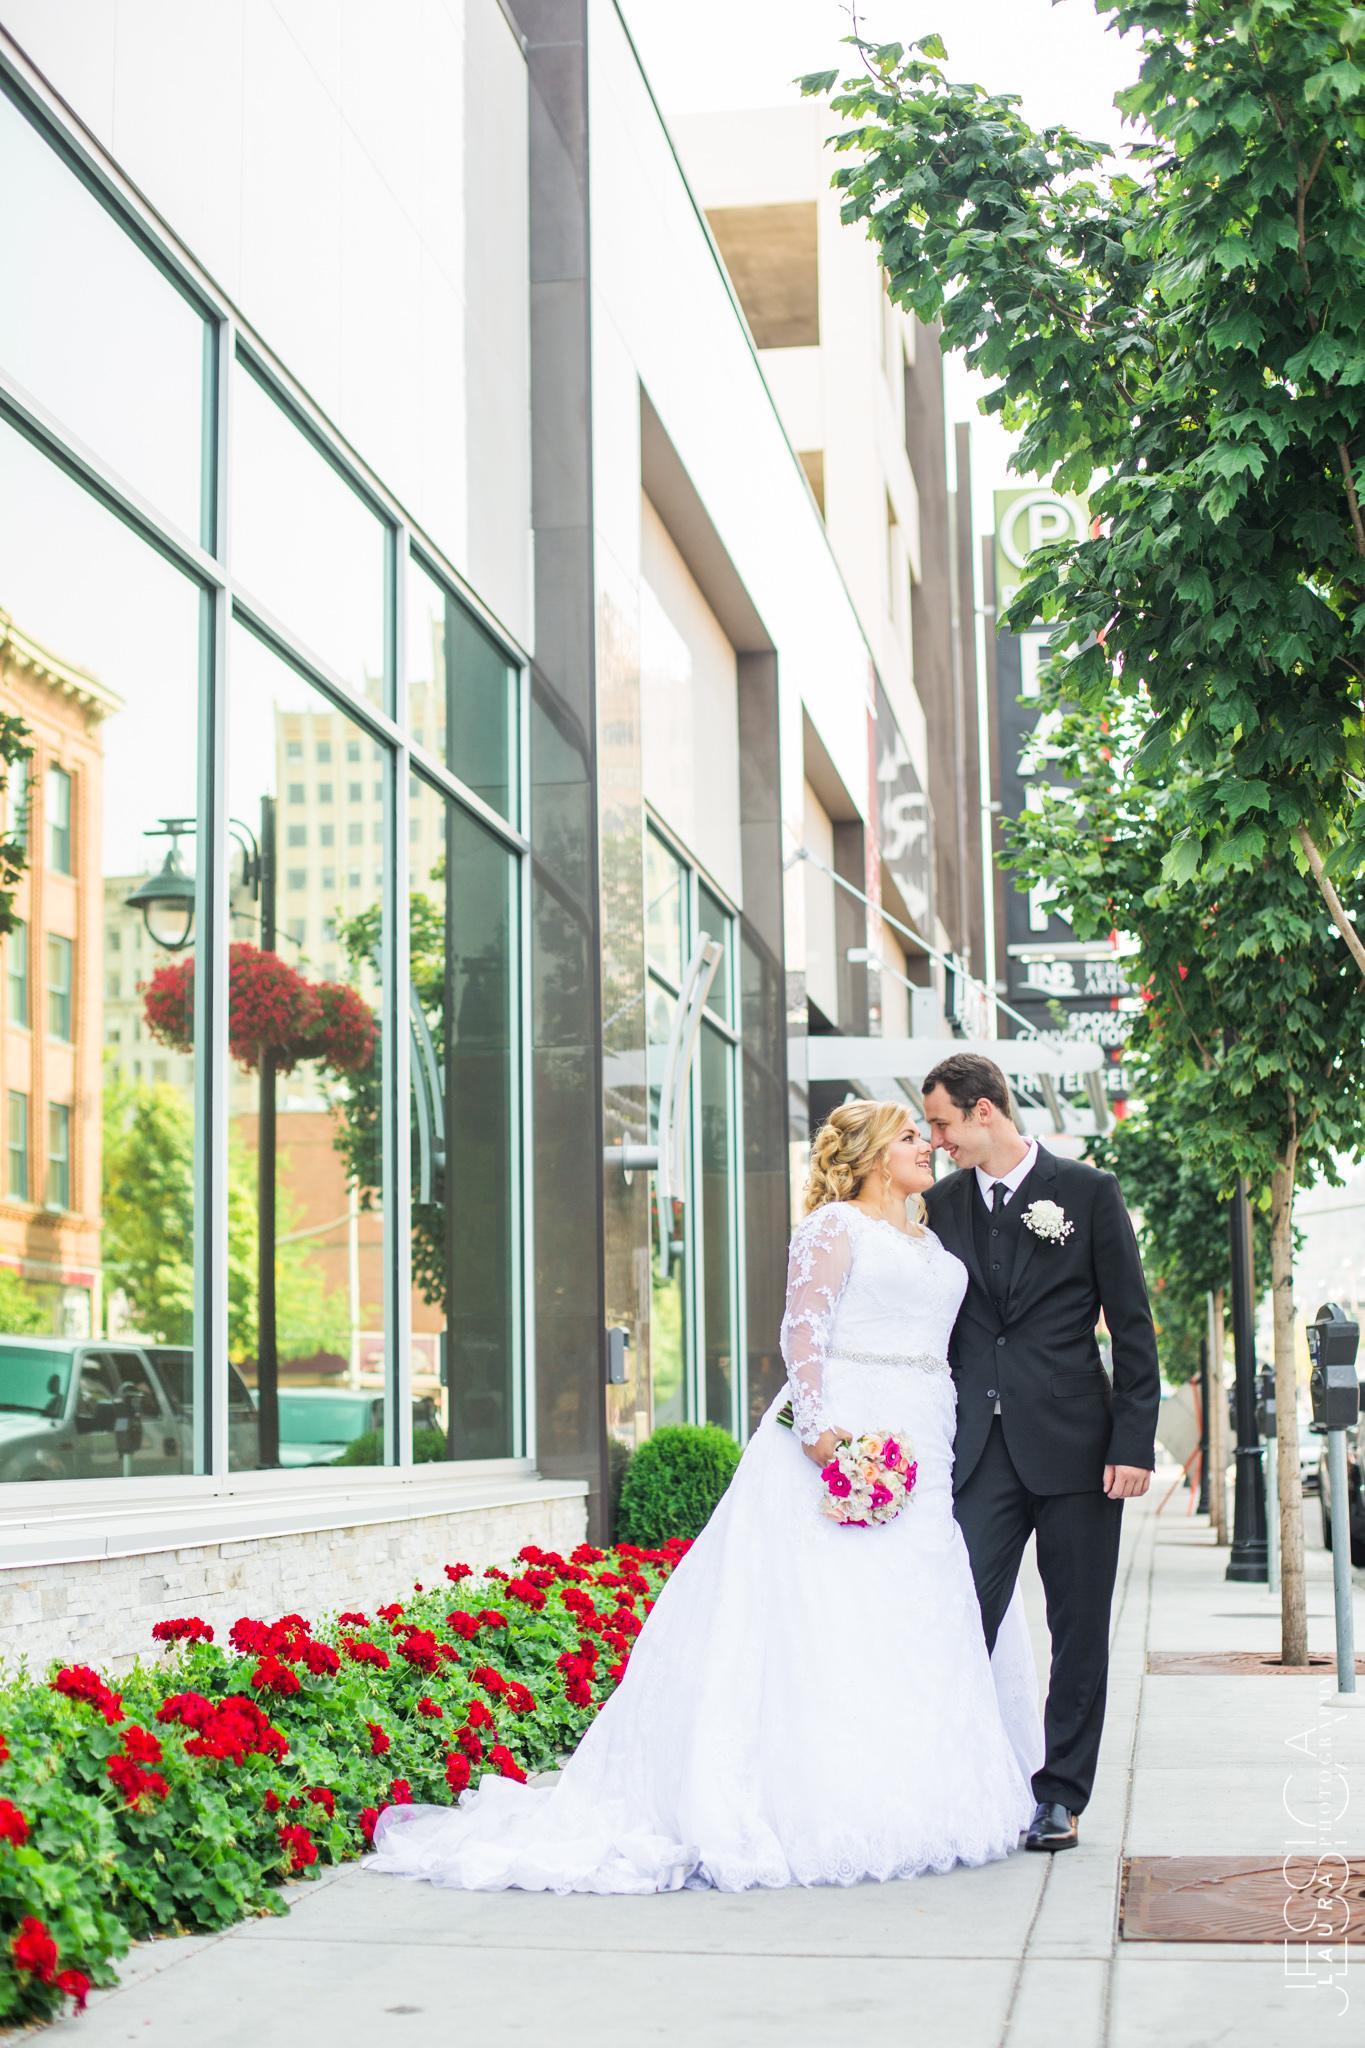 Eugene-Maryana_wedding_08062017_web (101 of 558).JPG